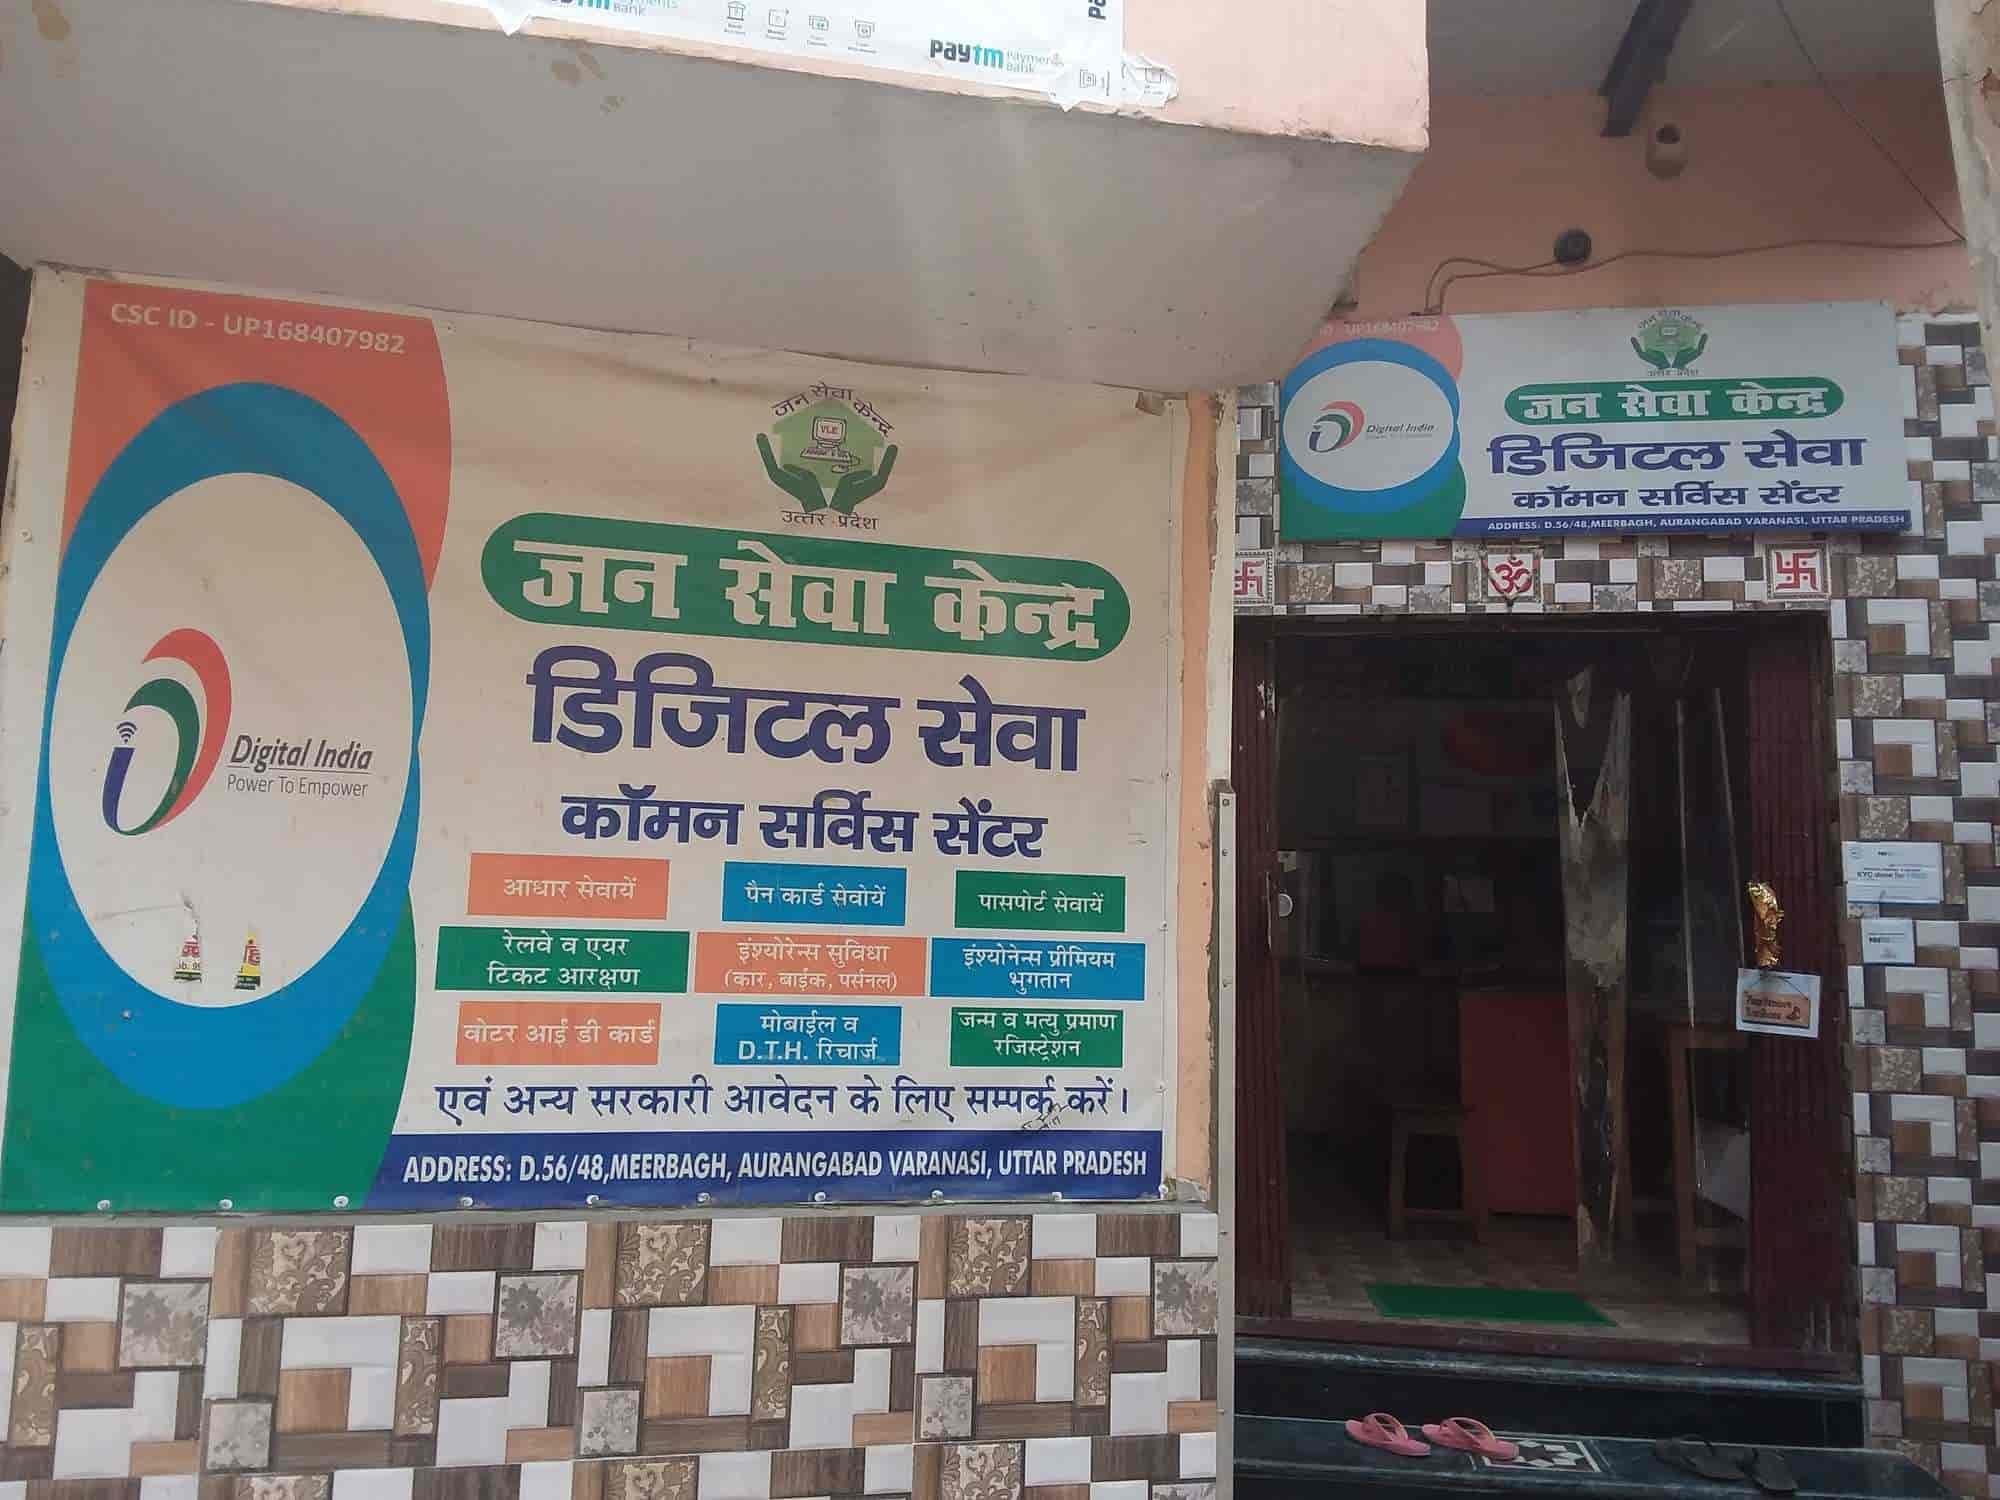 Jan Sewa Kendra CSC, Aurangabad - Life Insurance Agents in